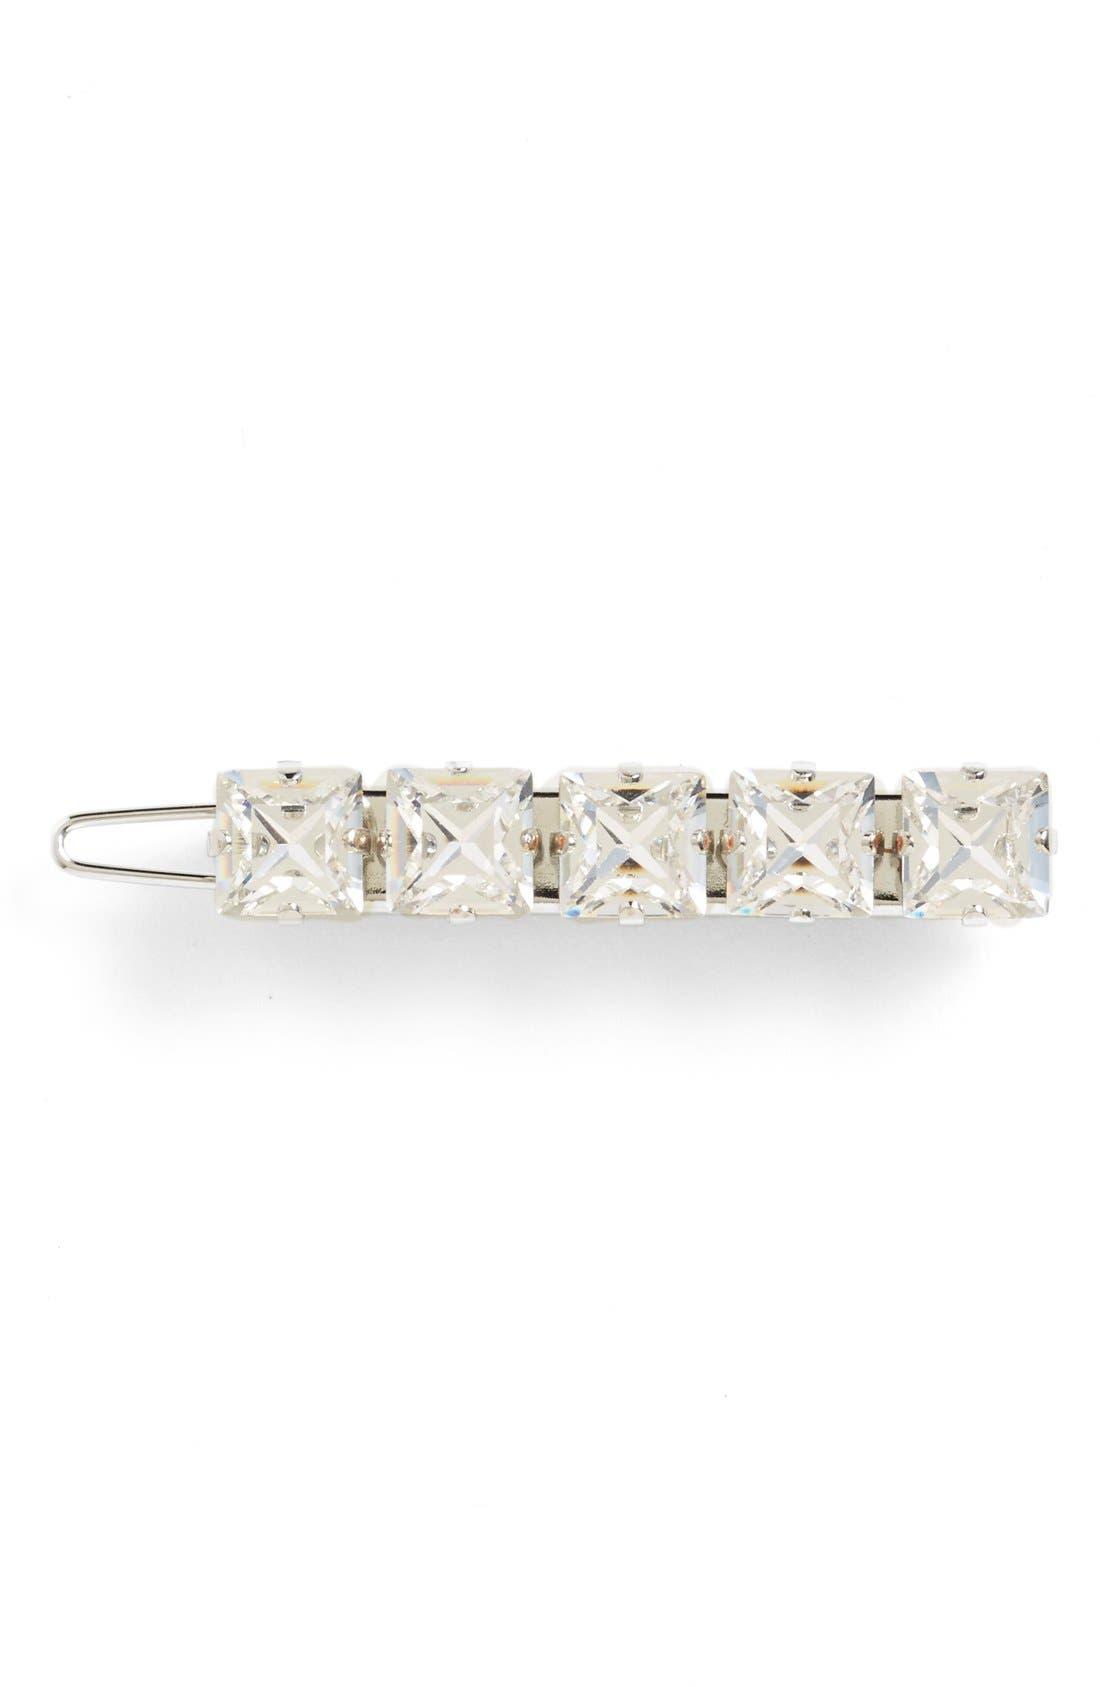 'Square Jewel' Swarovski Crystal Tige Boule Barrette,                         Main,                         color, 040